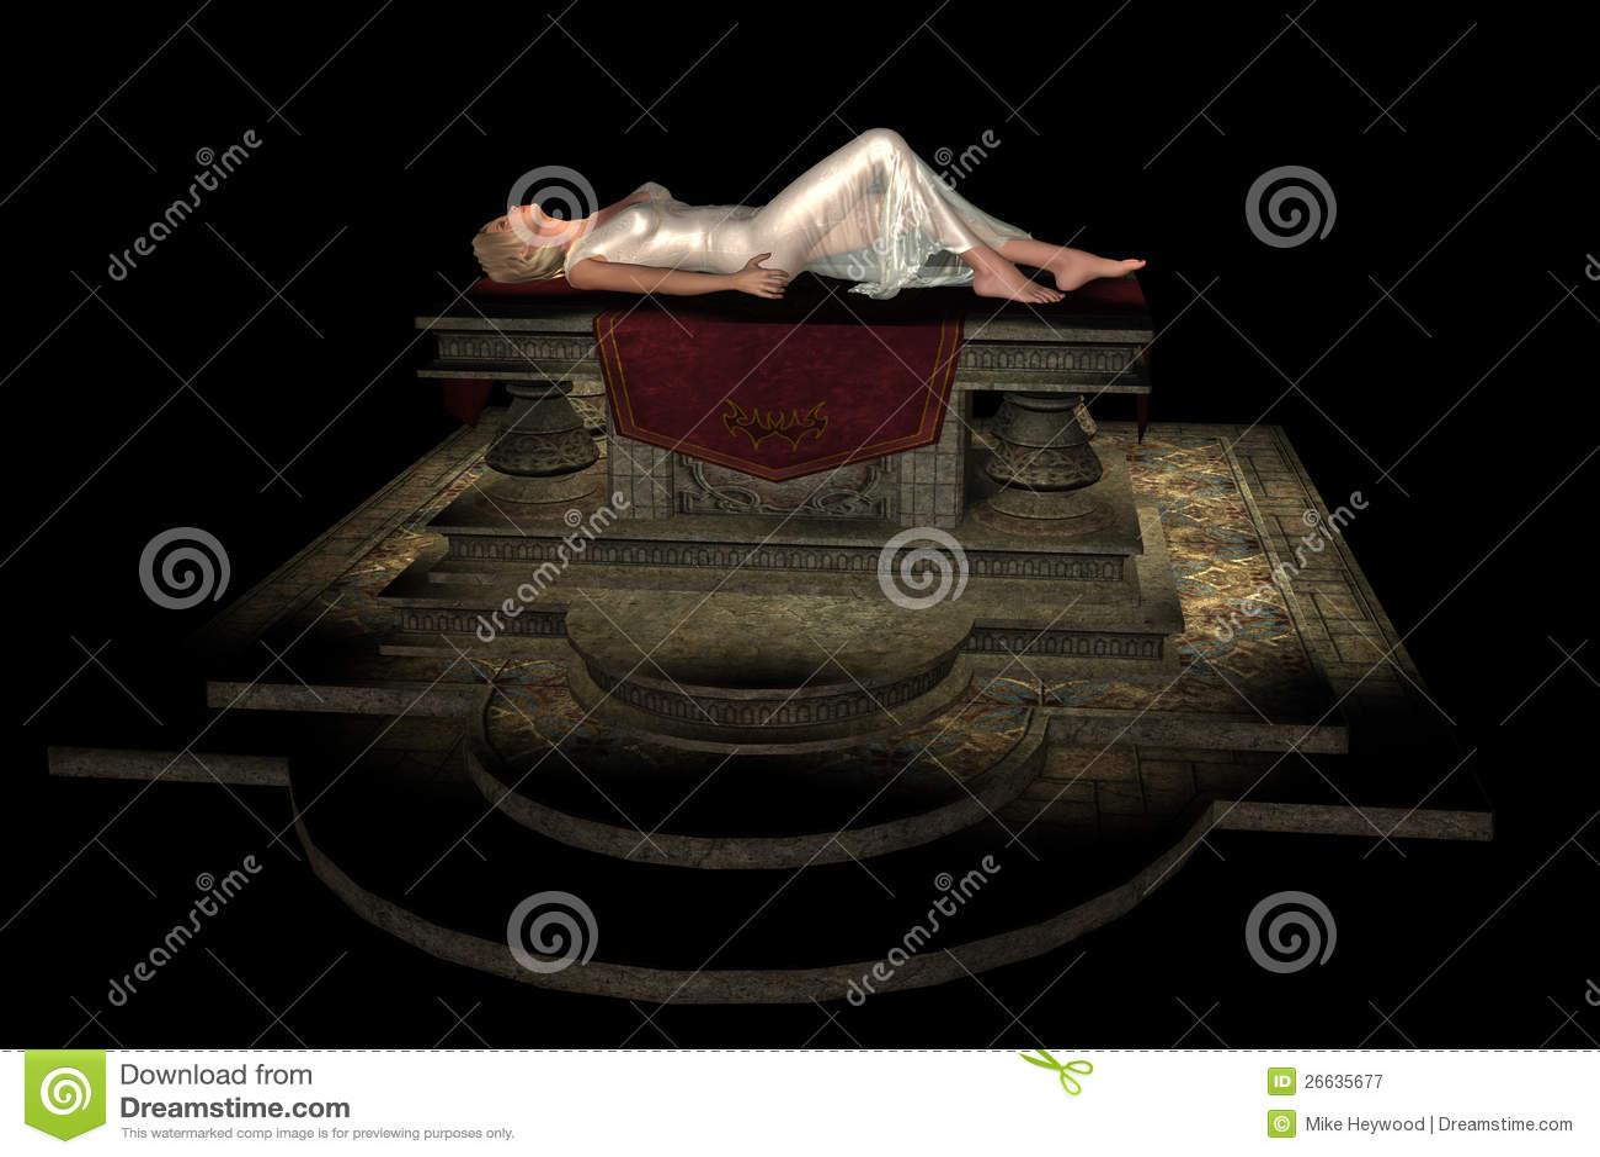 Female altar sacrifice naked movie